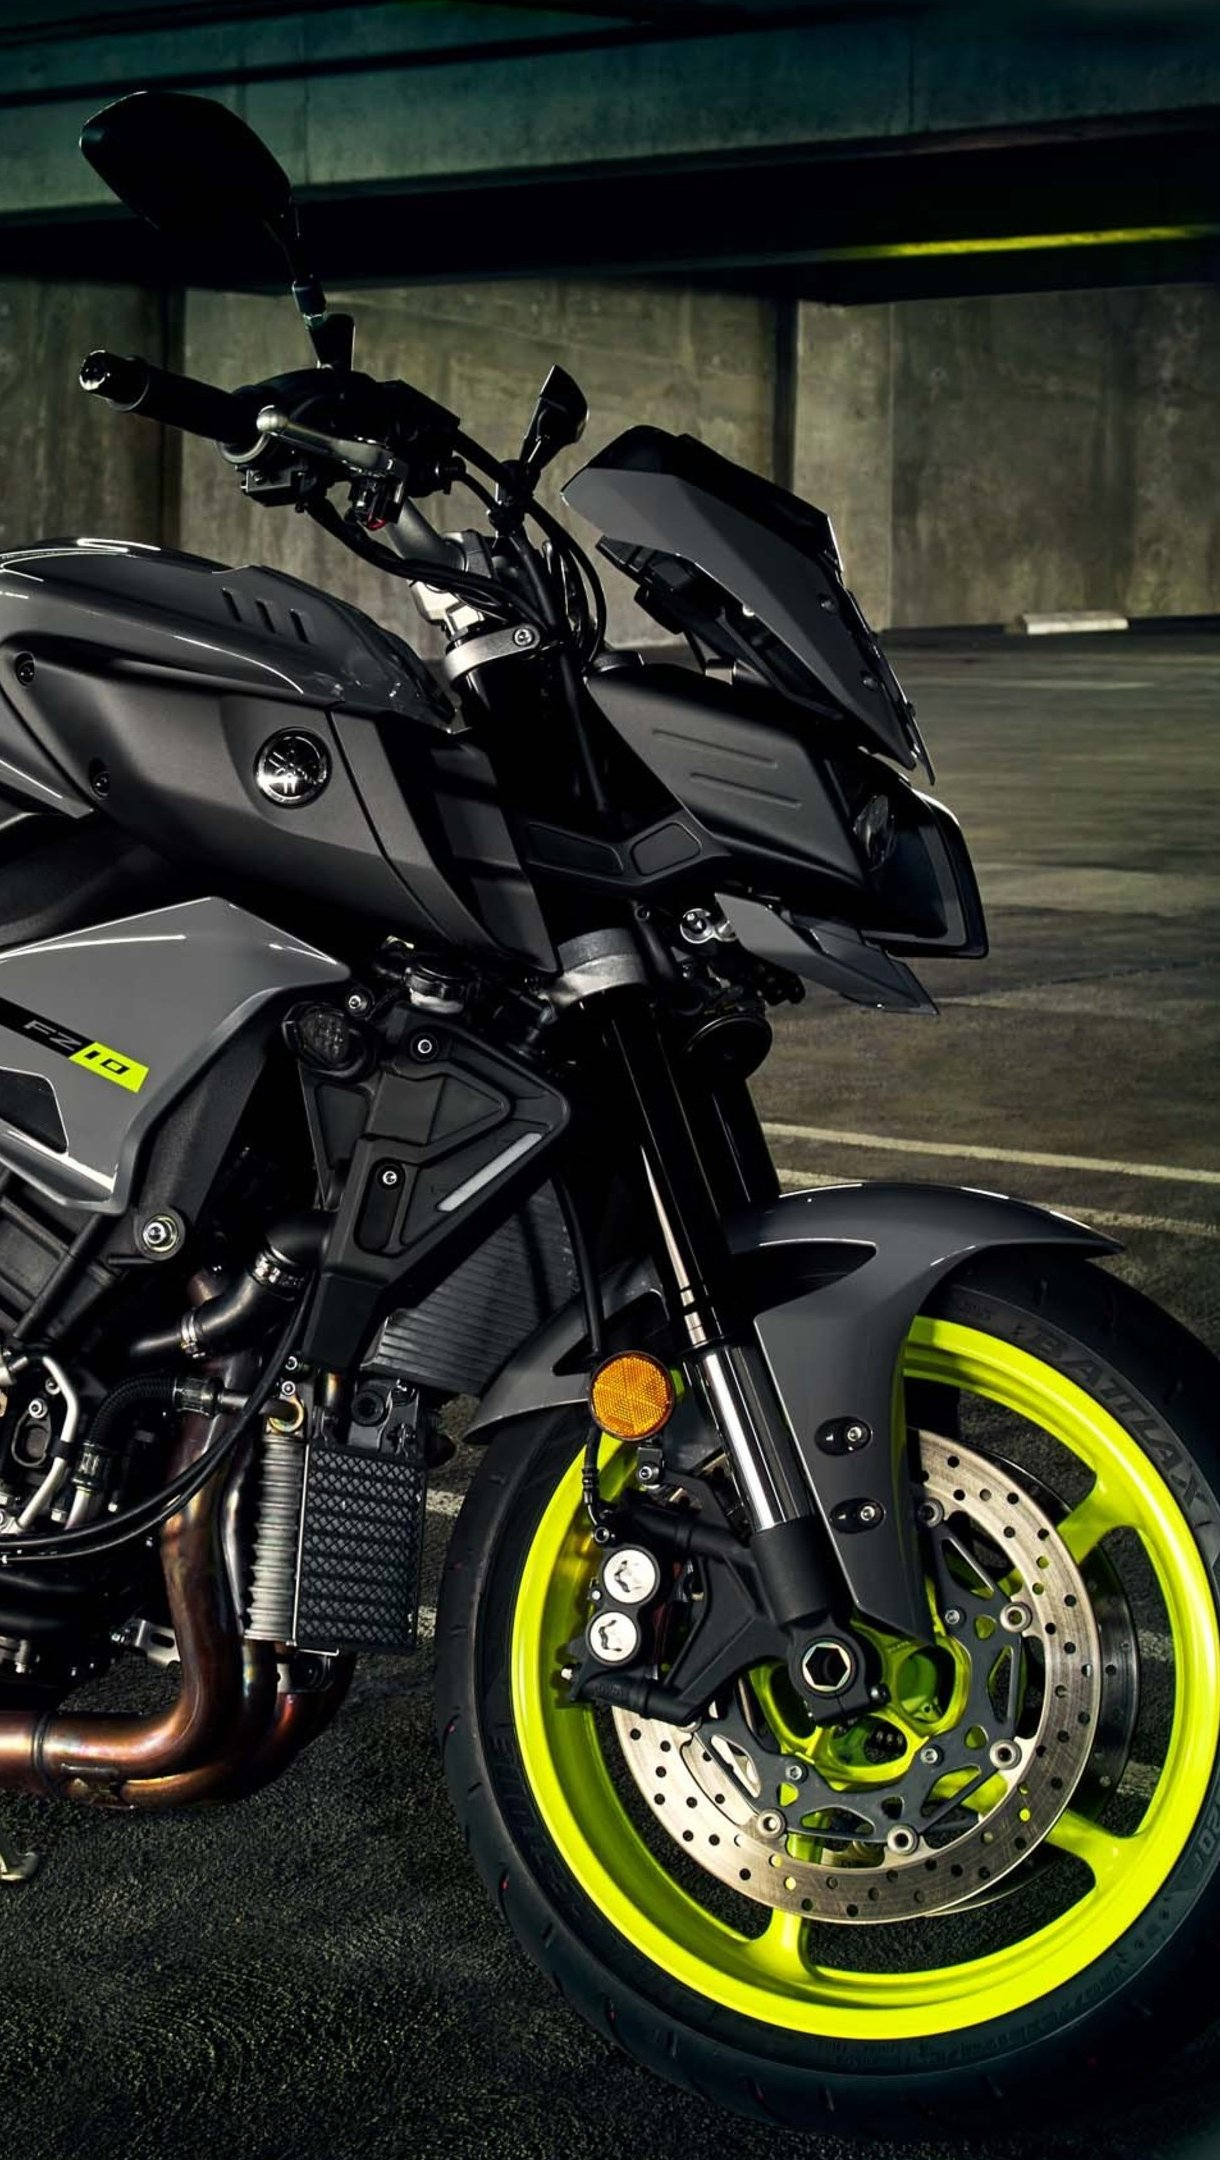 Wallpaper Yamaha FZ 10 Motorcycle Vertical